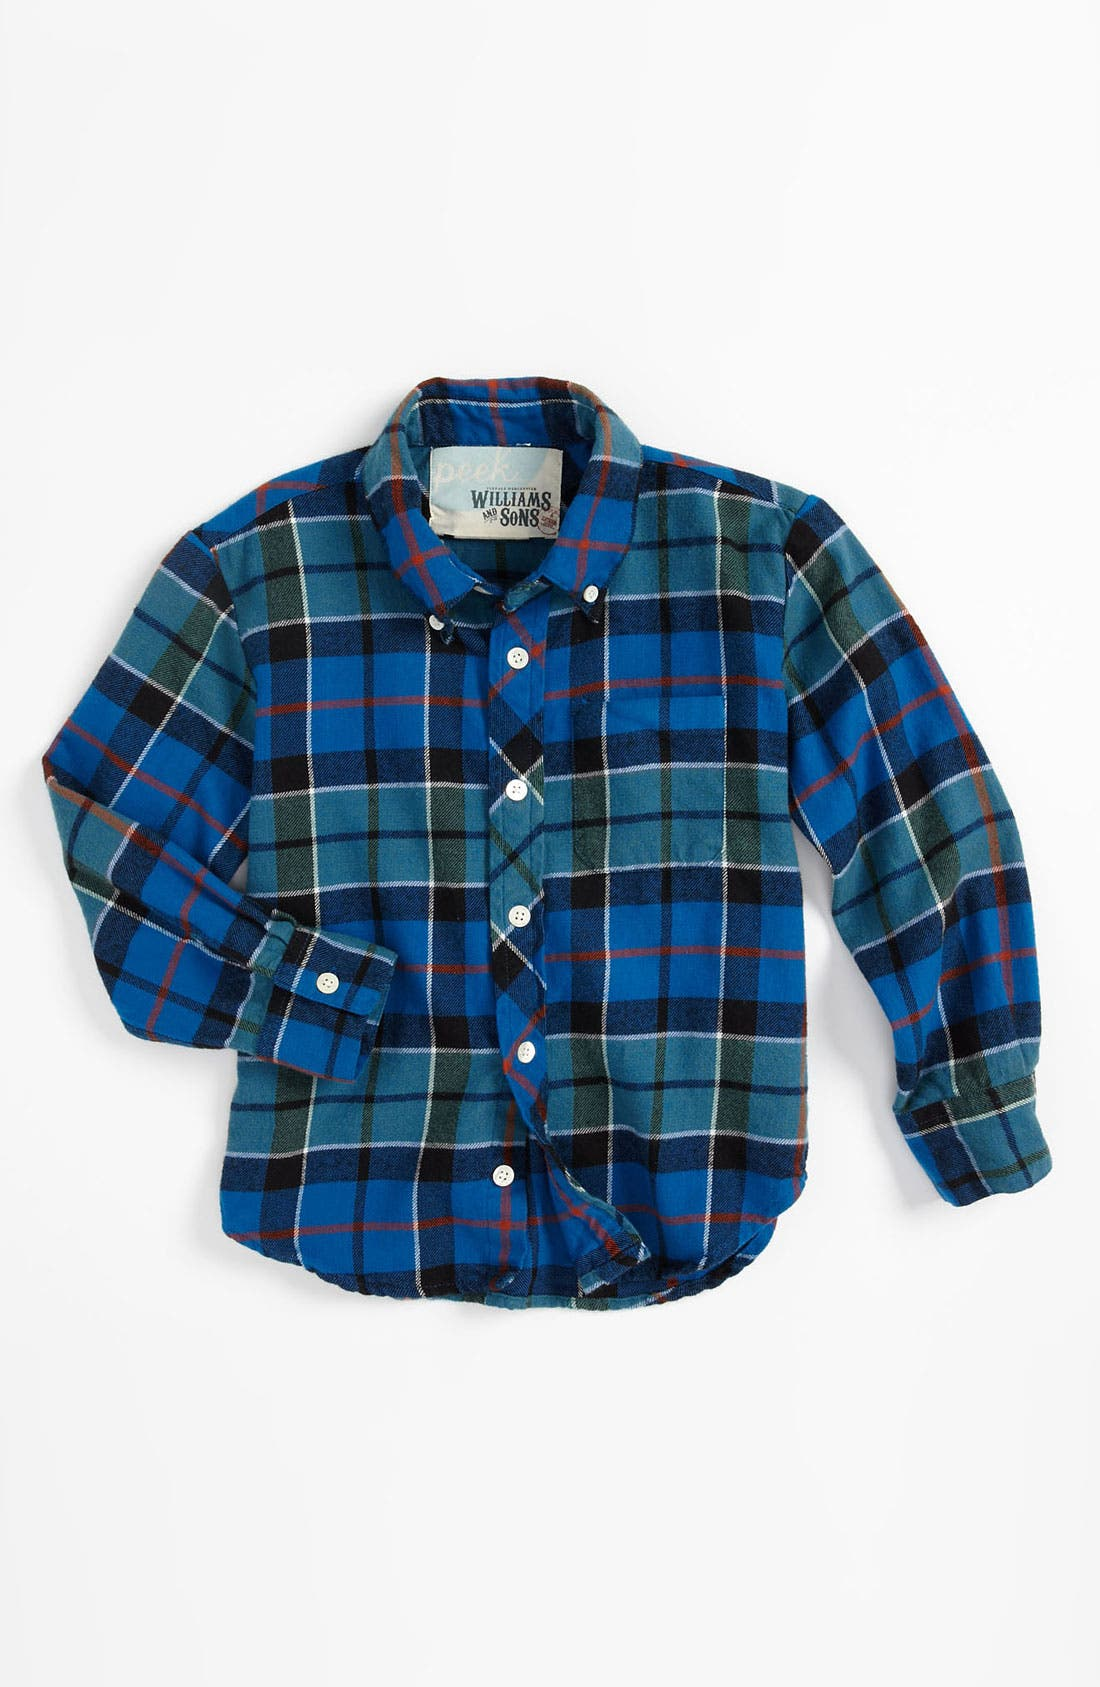 Alternate Image 1 Selected - Peek 'Barstow' Plaid Shirt (Toddler, Little Boys & Big Boys)